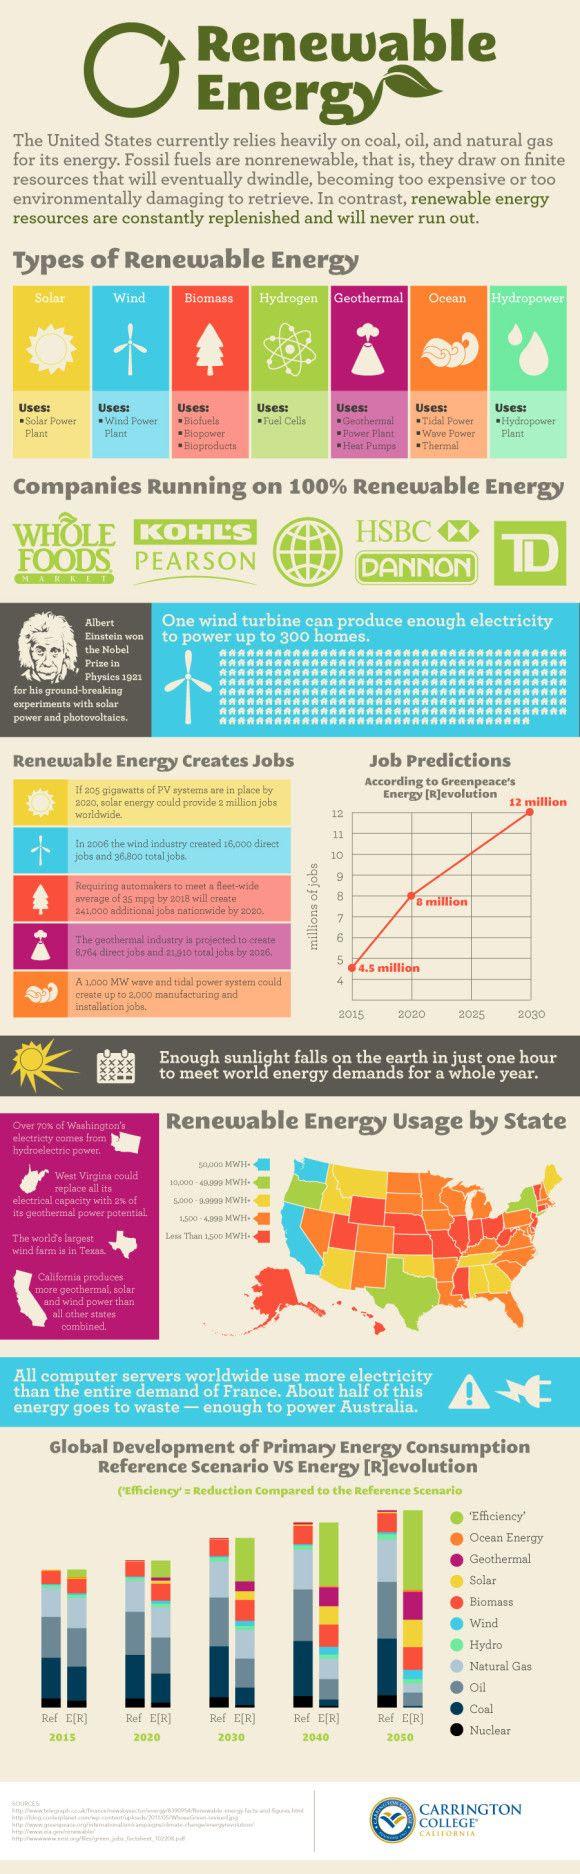 #Infographic #Marketing #Resea